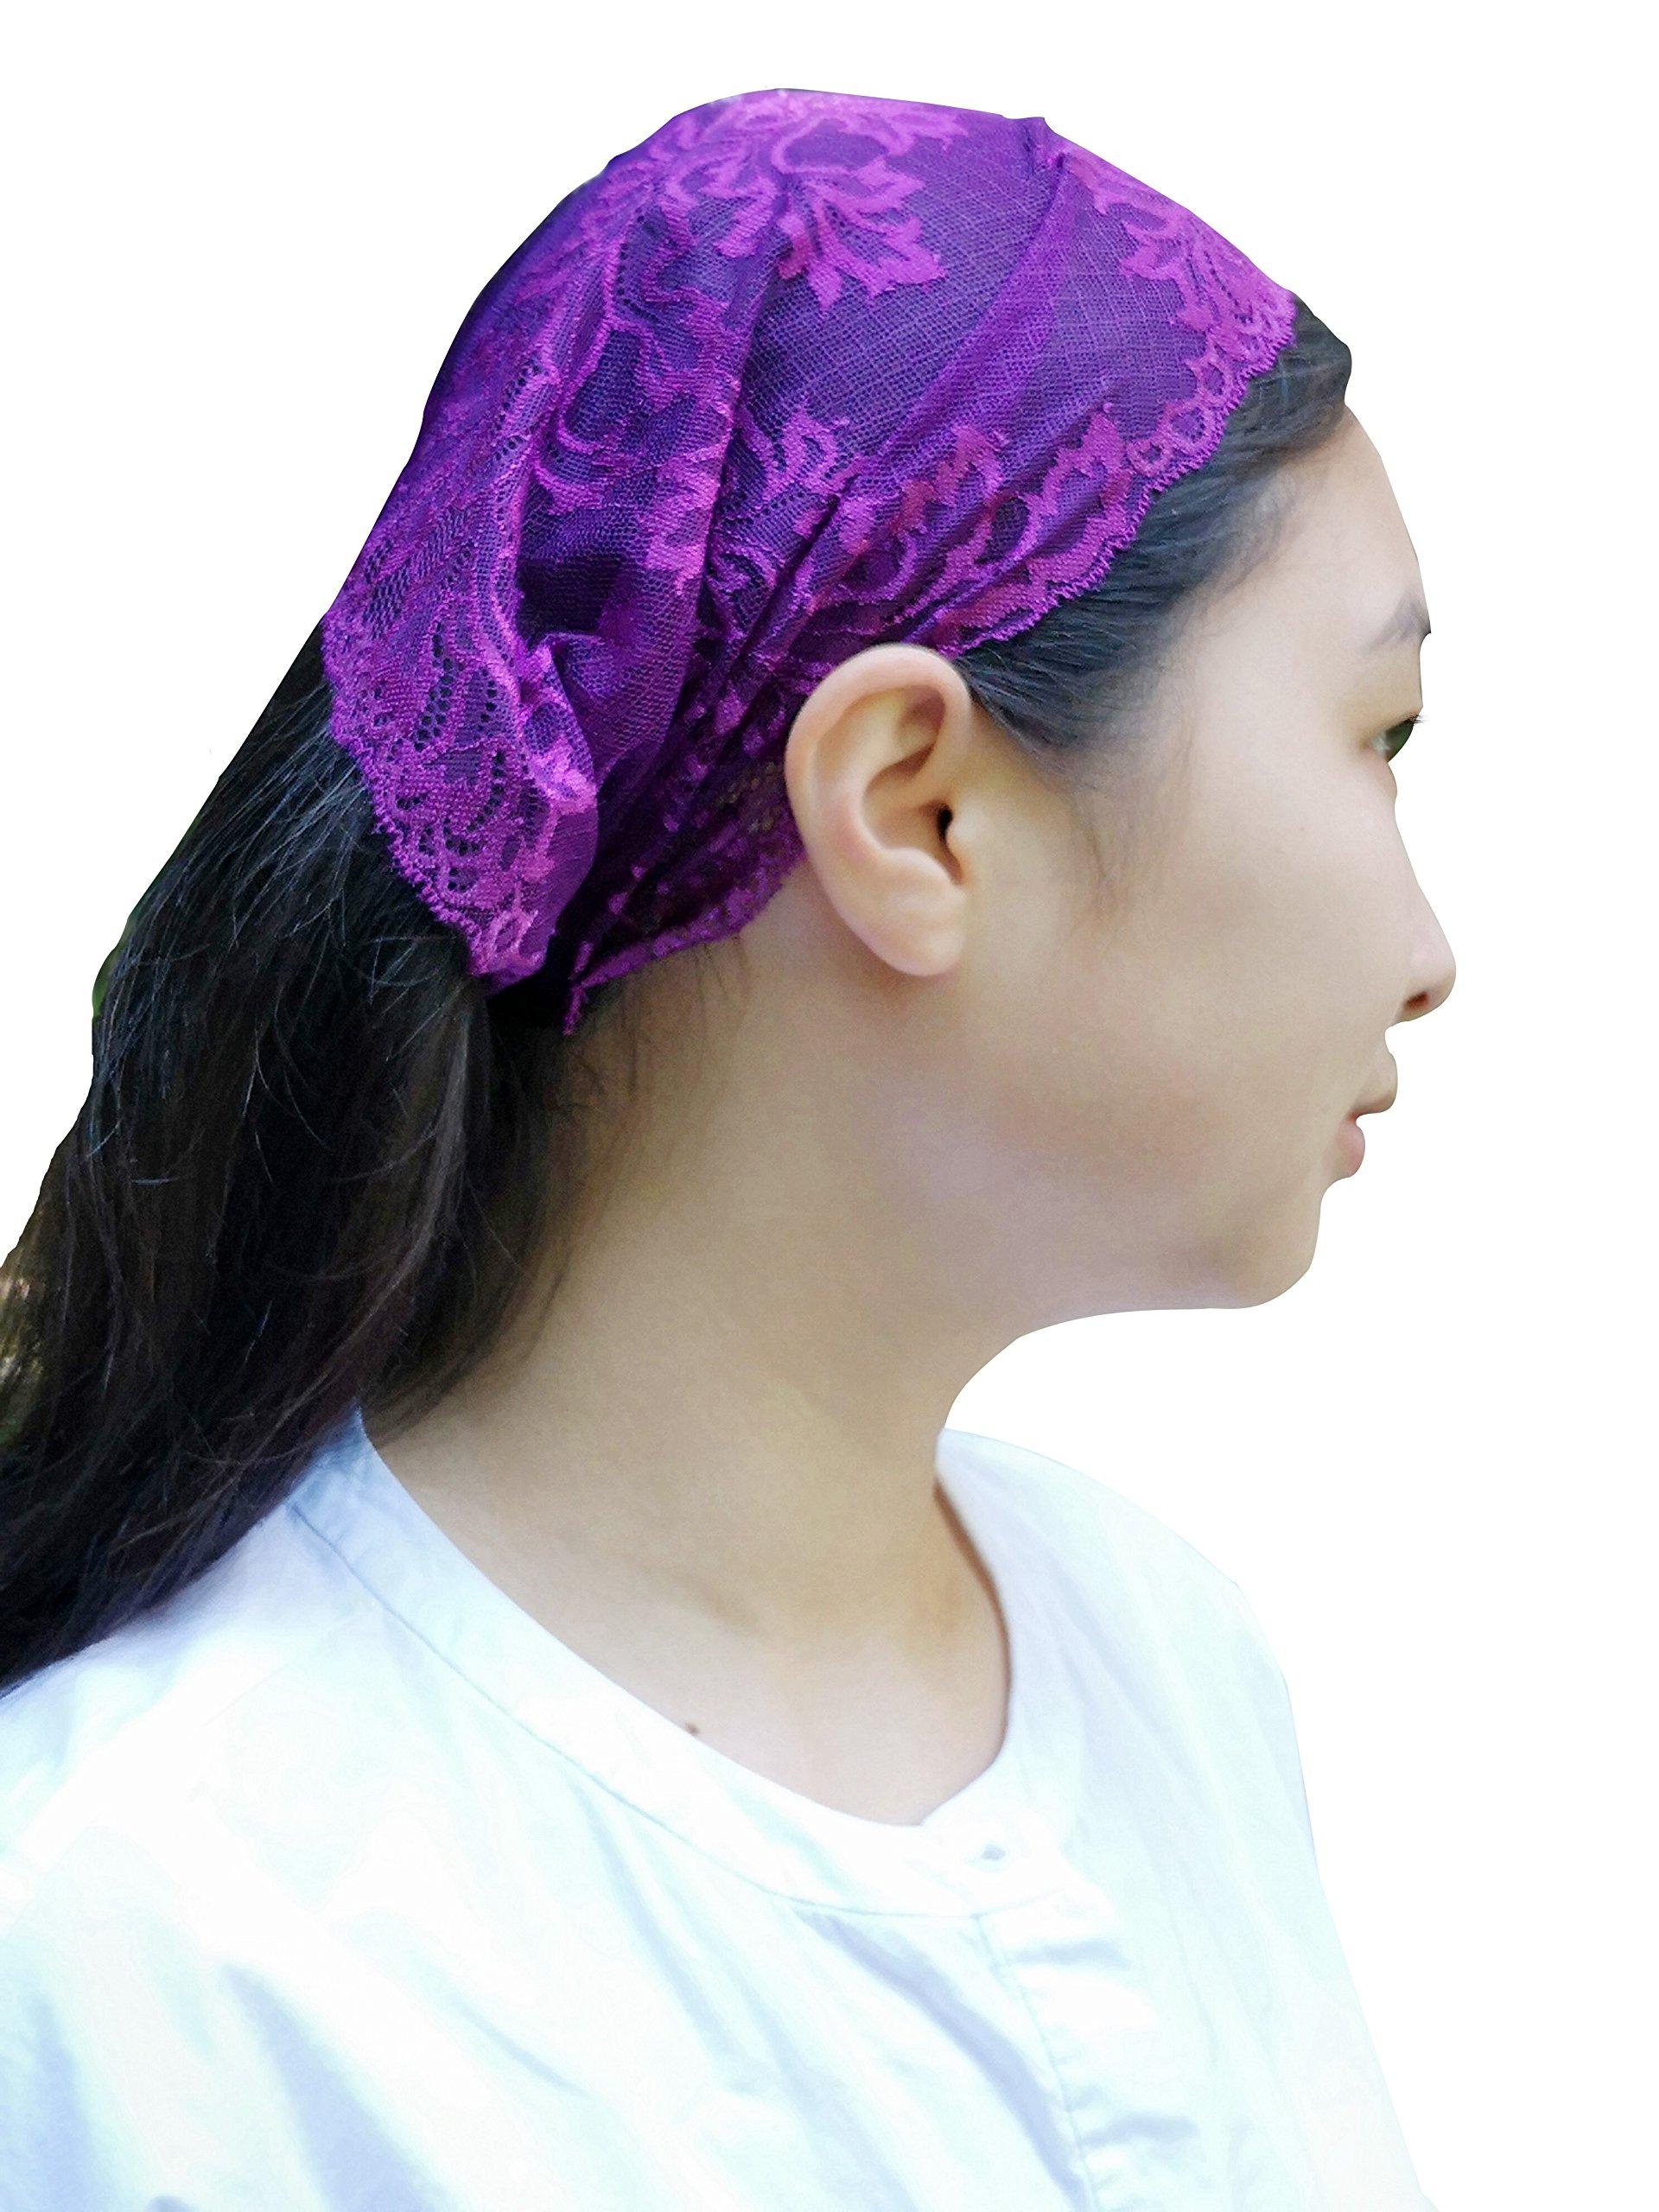 Church Veil Headwrap Lace Headband Kerchief Tie-style Head Covering Y031 (purple)